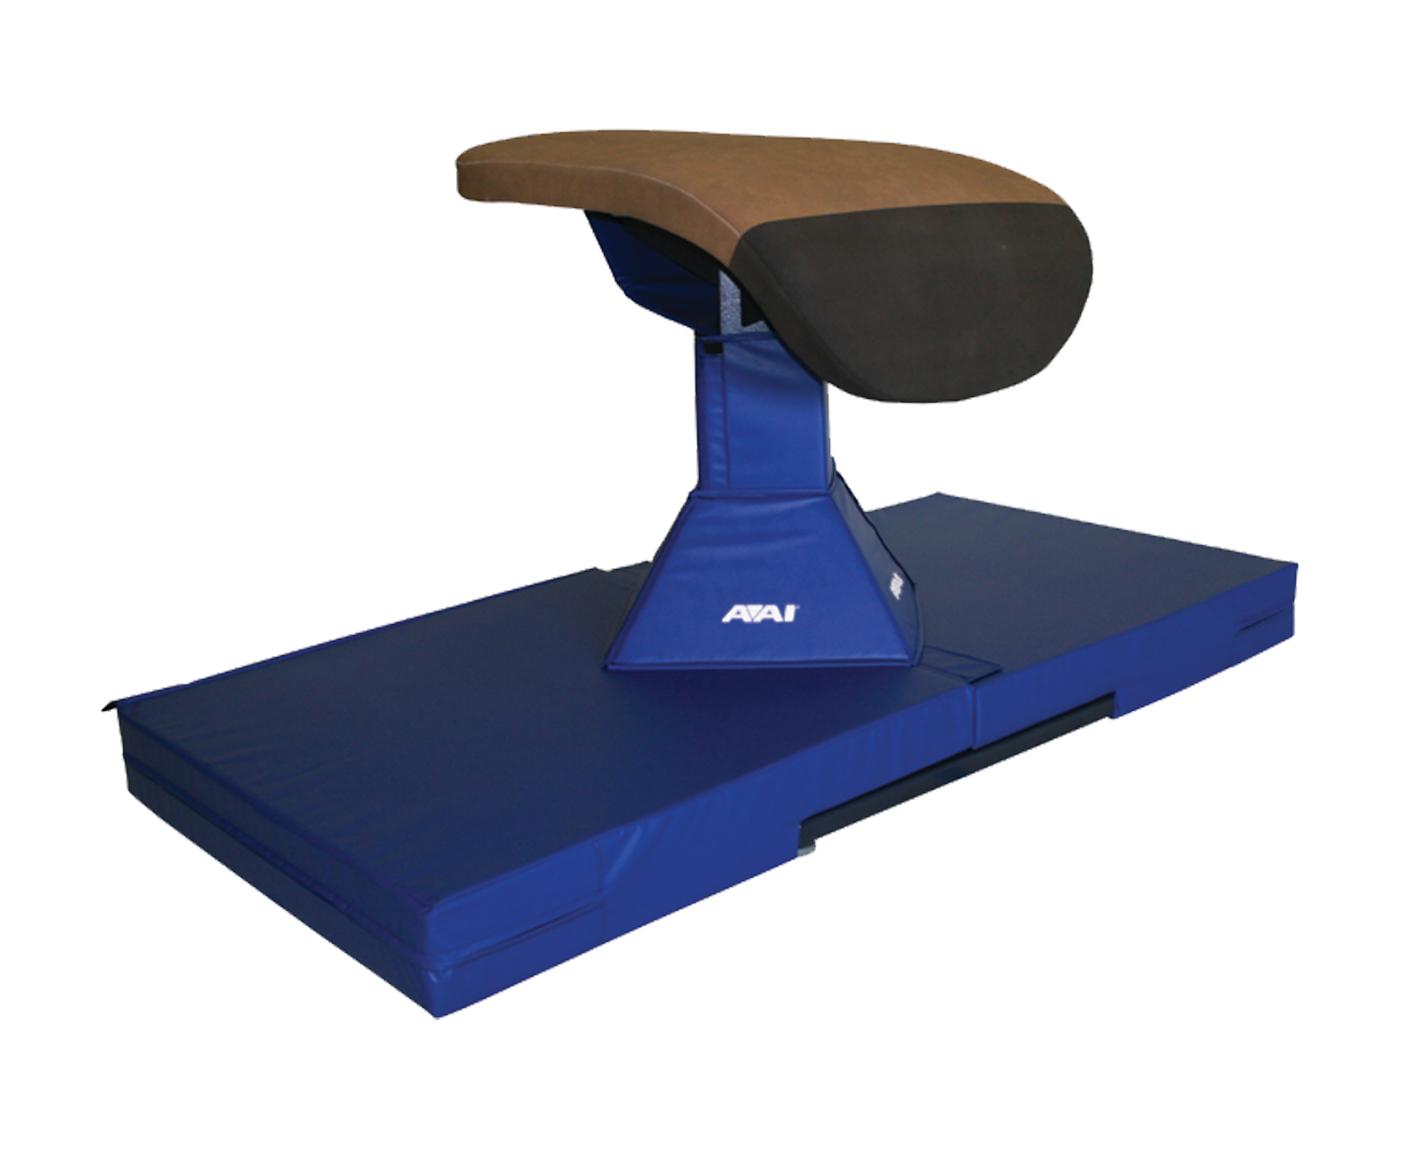 Aai Elite Artistic Vault Table 407562 Nra Gym Supply